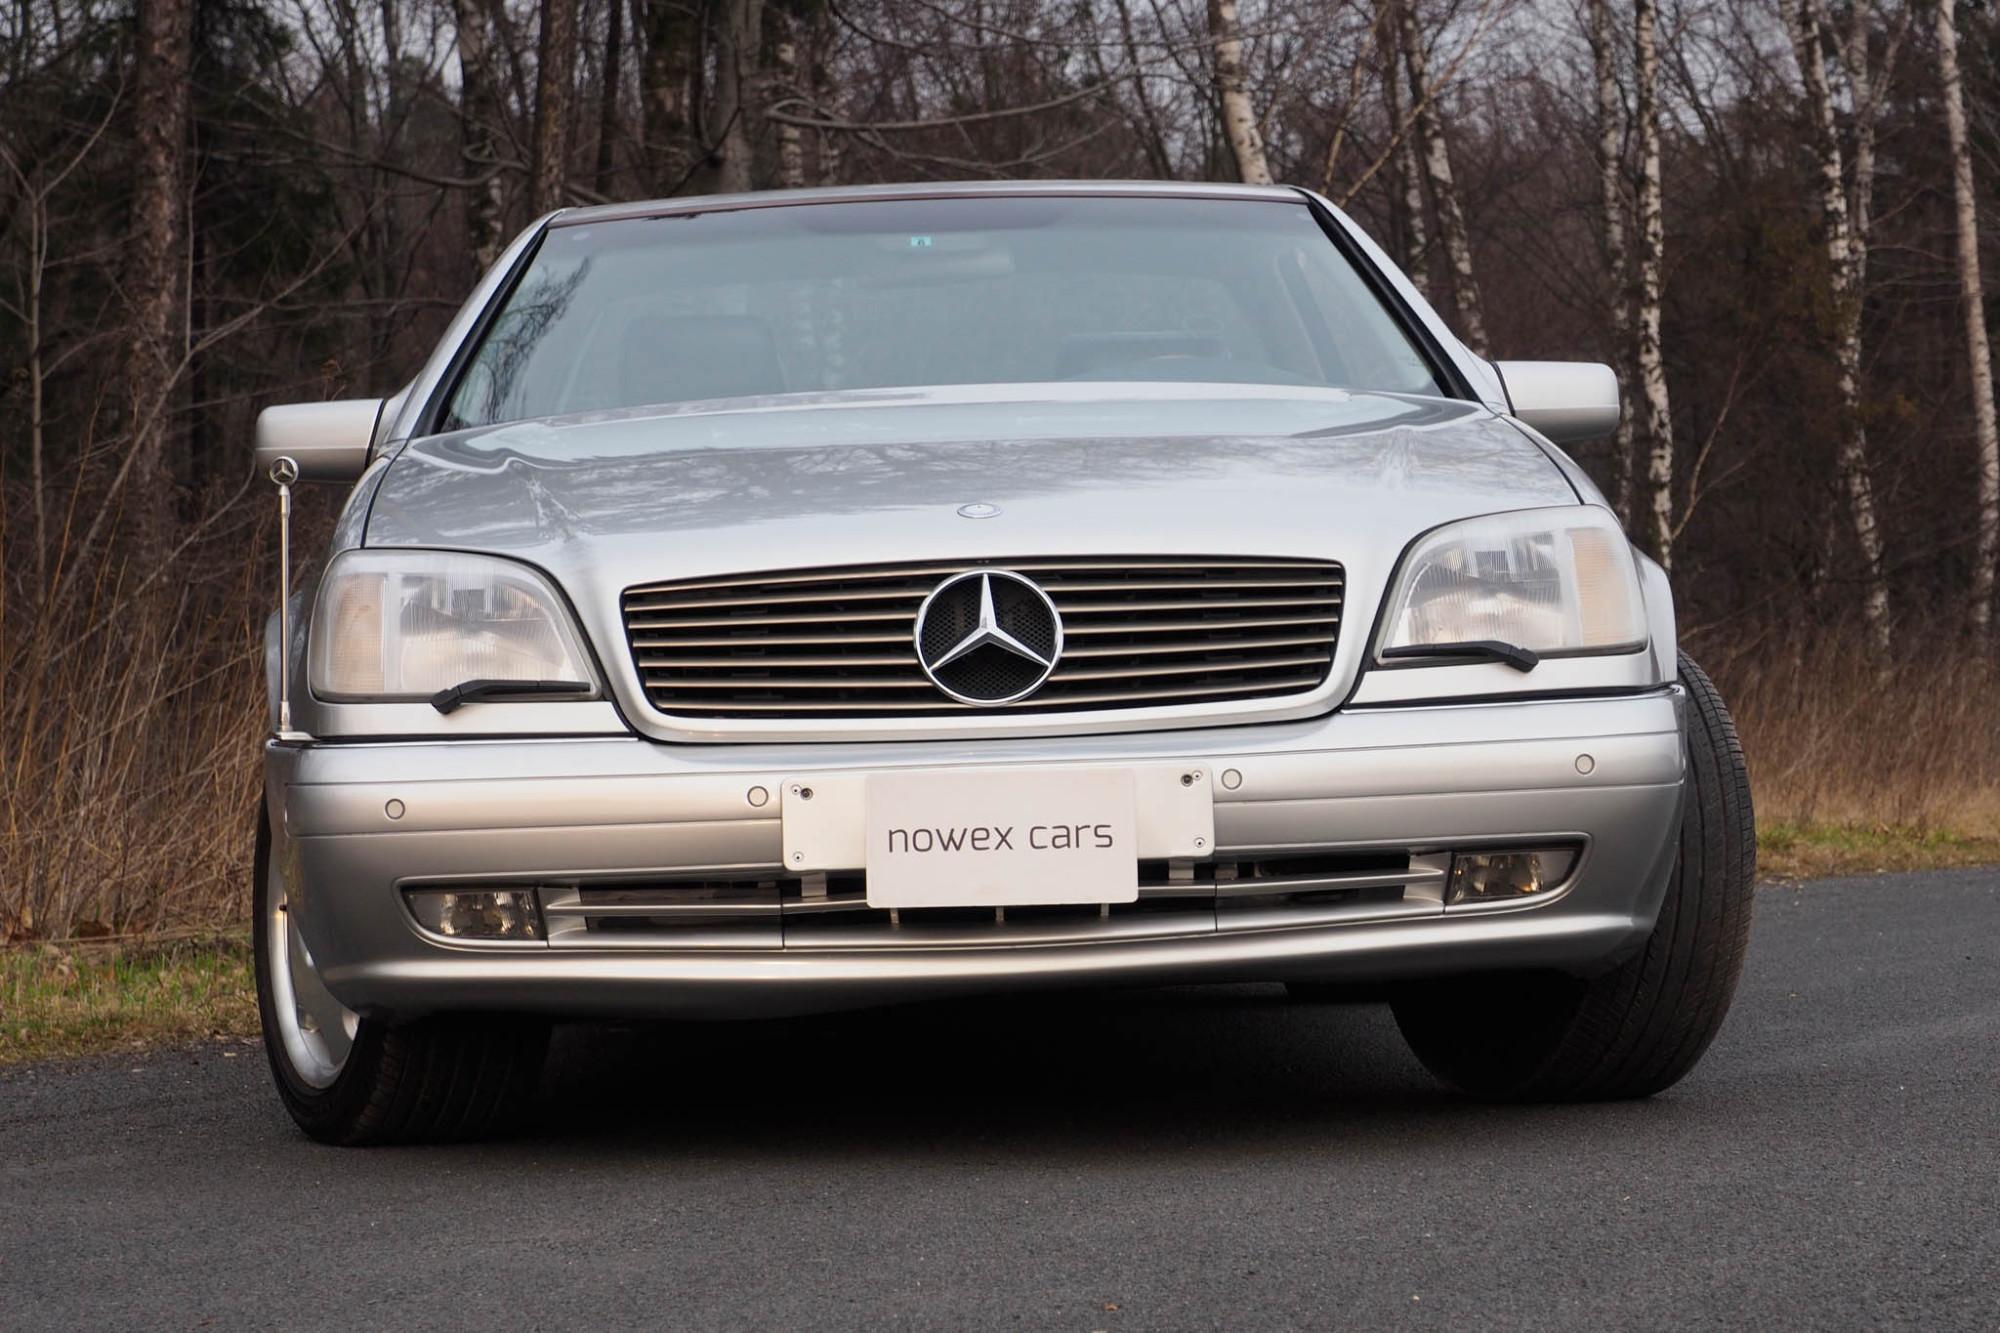 97 mercedes benz cl 600 nowex cars for 97 mercedes benz